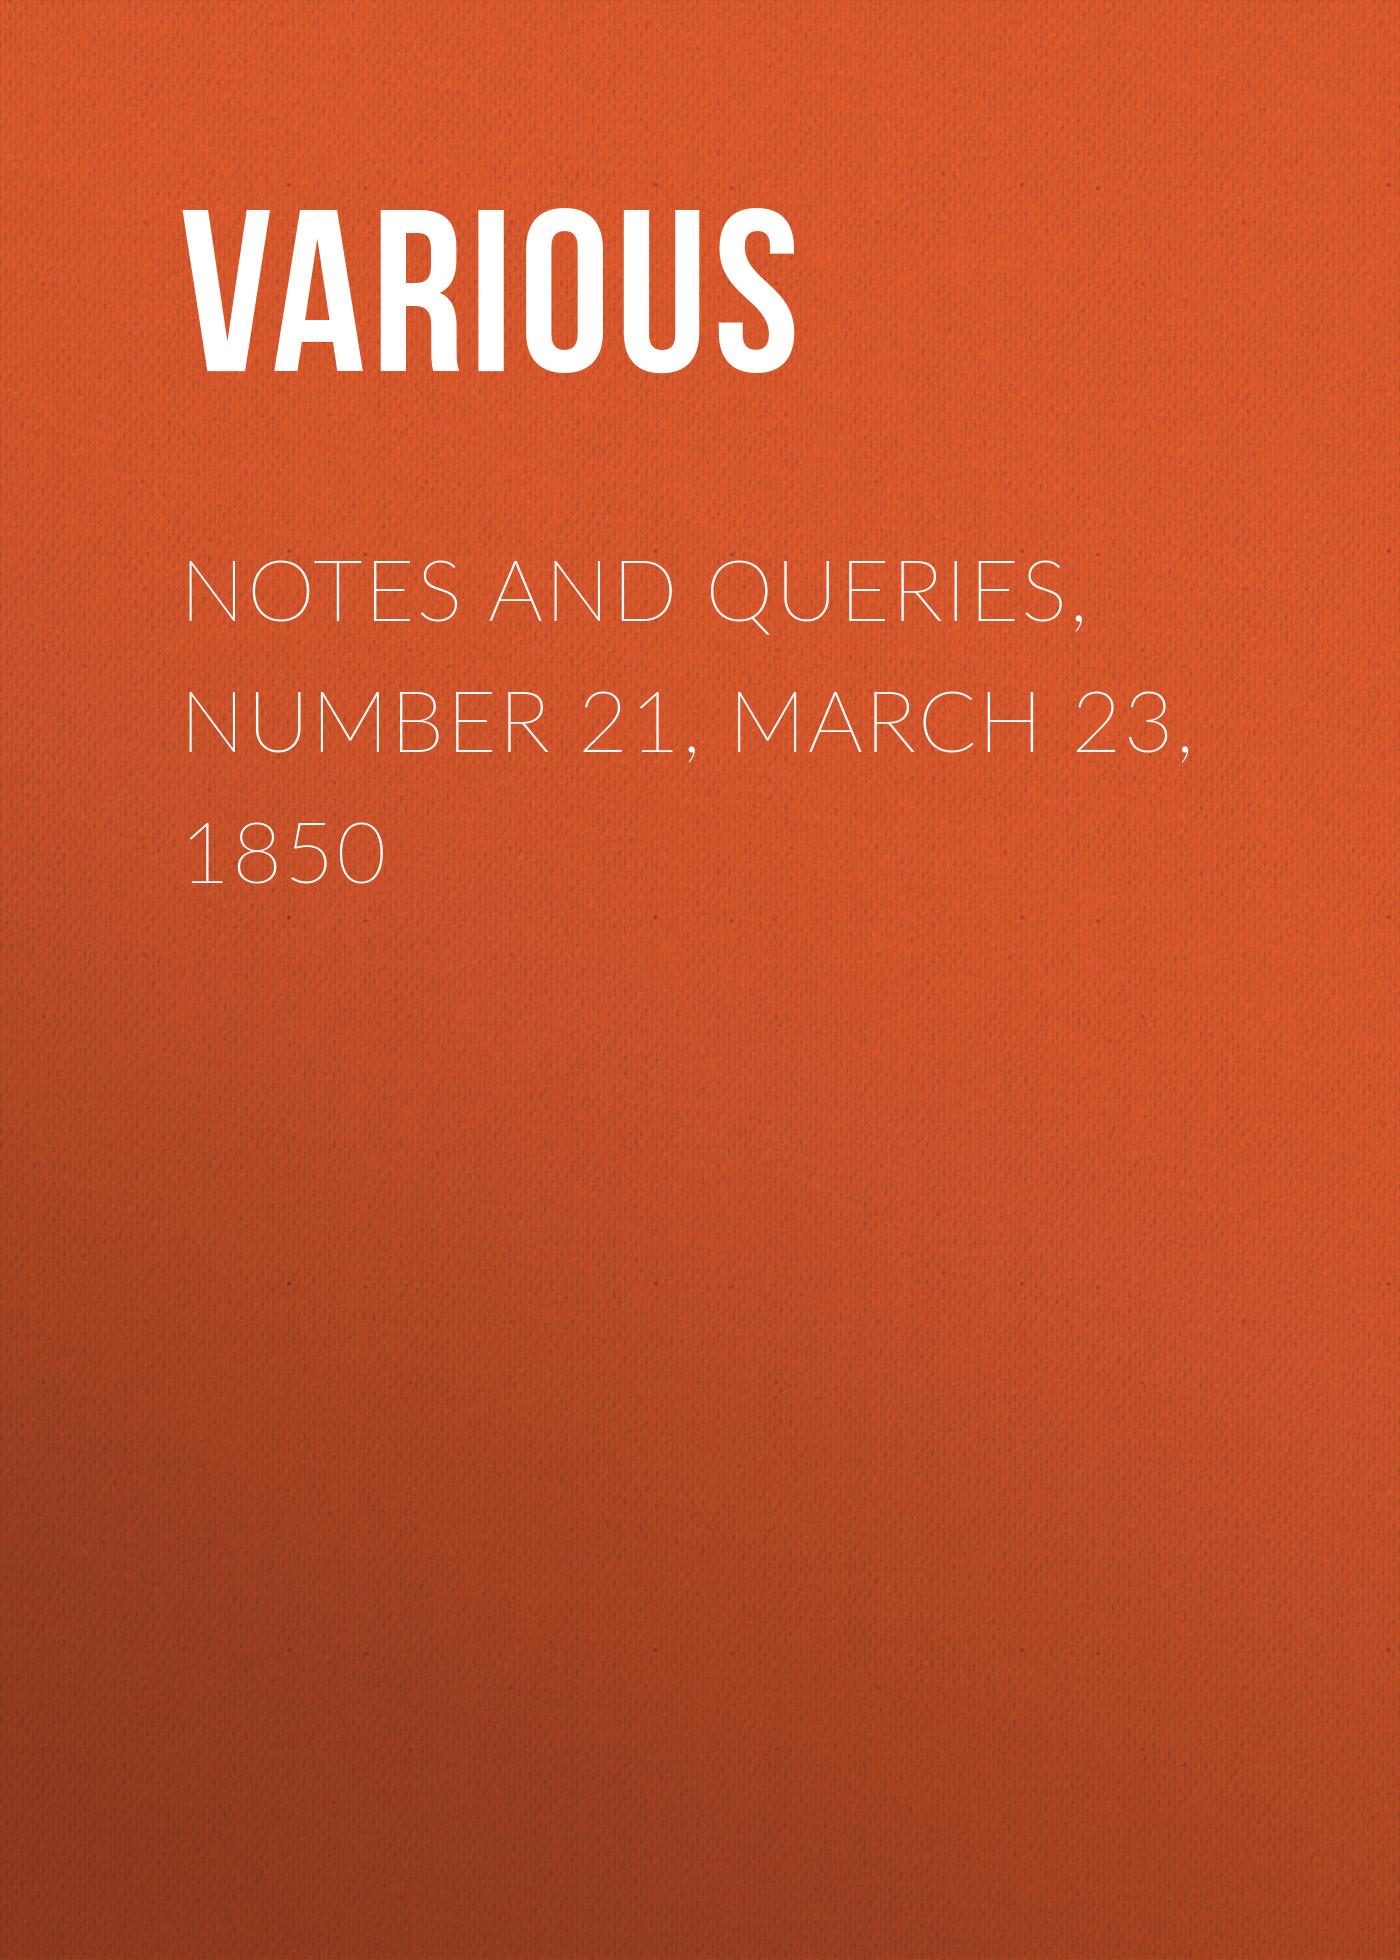 Various Notes and Queries, Number 21, March 23, 1850 картридж hp cz110ae 655 голубой dj ia 3525 4615 4625 5525 600стр